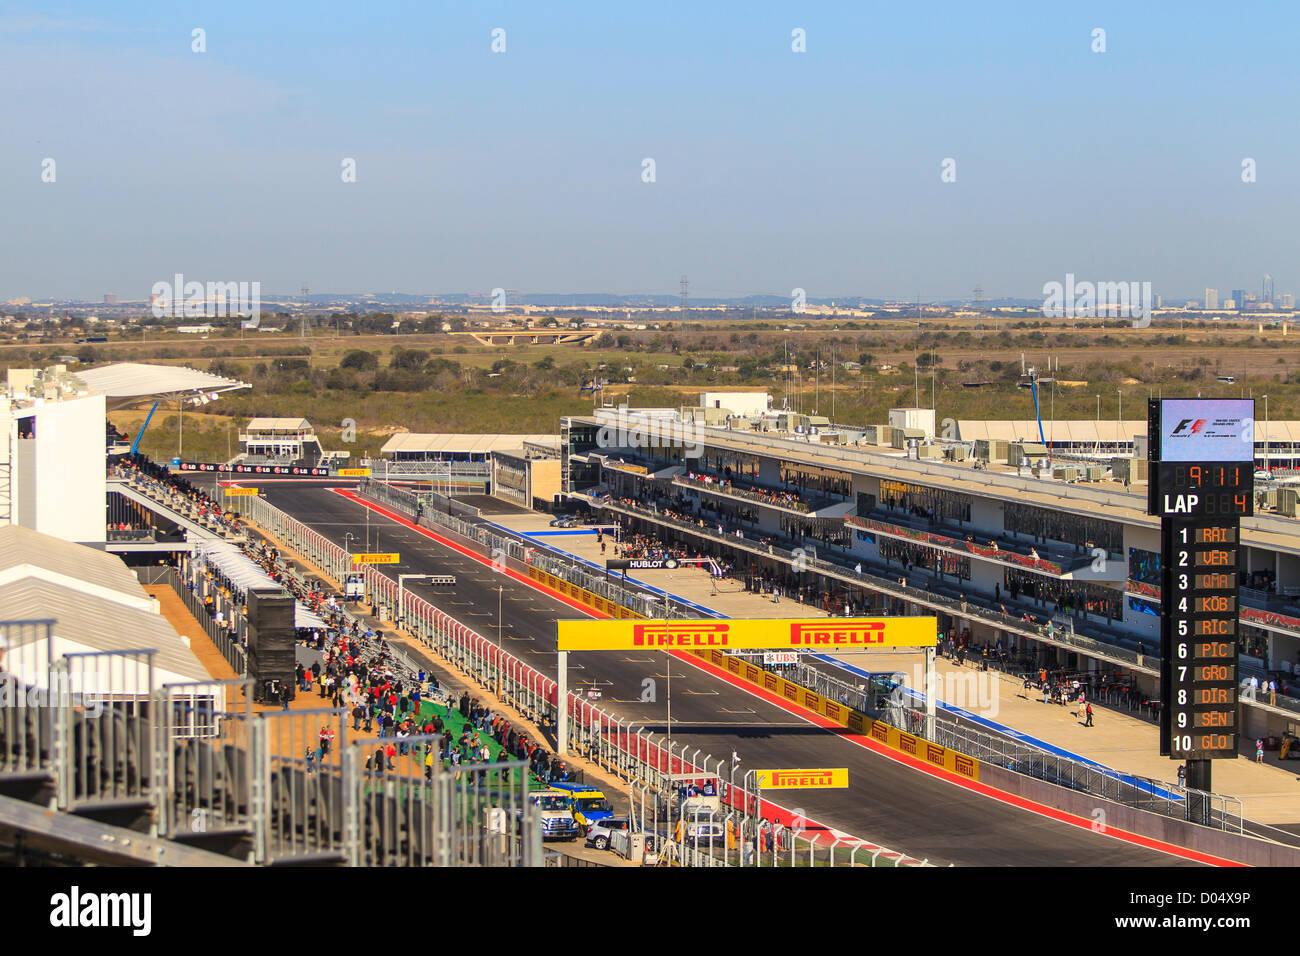 Circuit of the Americas, Austin, Texas, Formula 1 - Stock Image